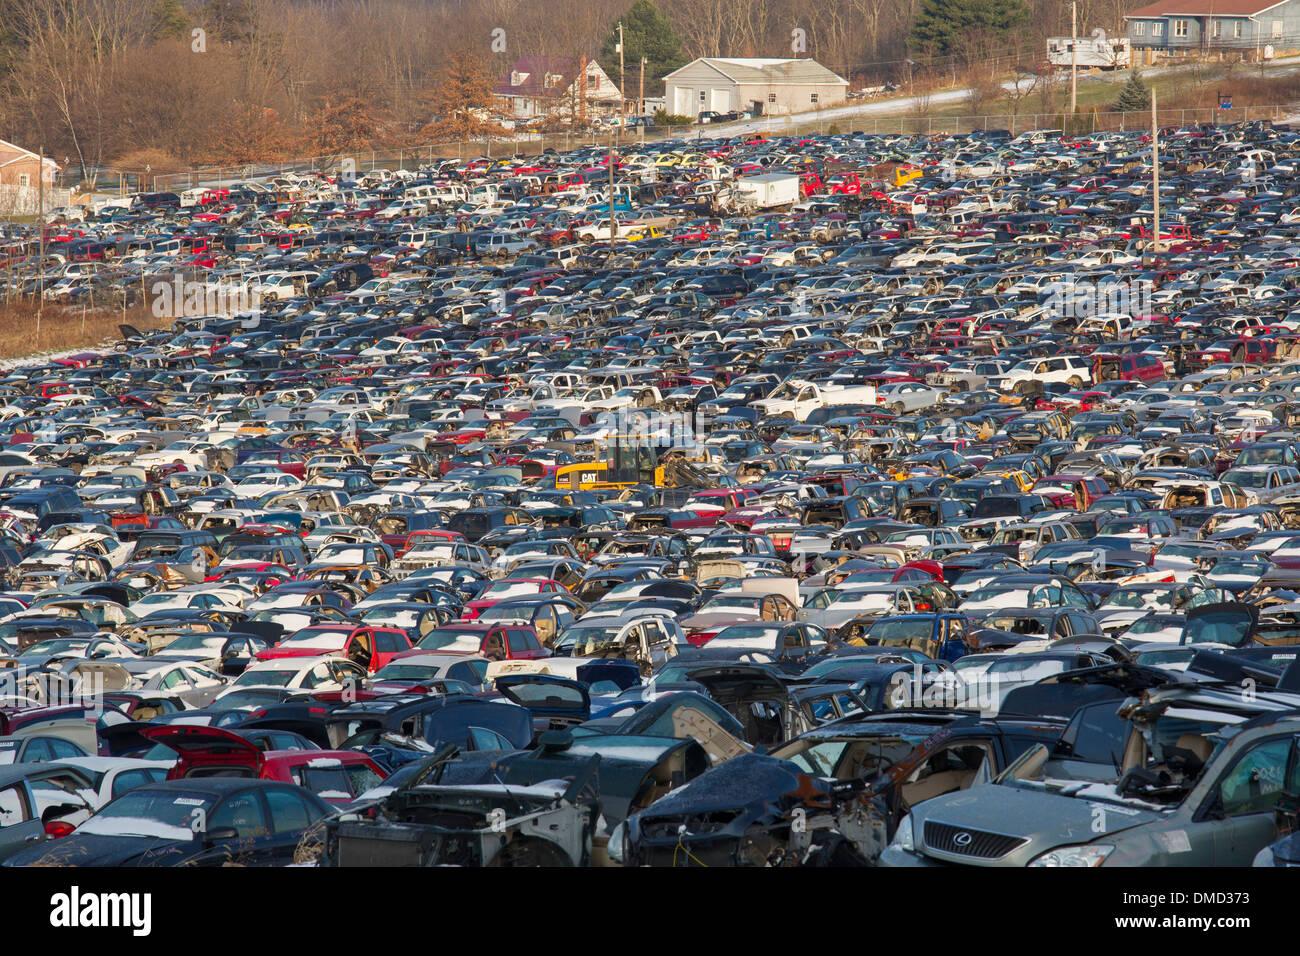 Stoystown, Pennsylvania - The 50-acre auto junkyard belonging to ...